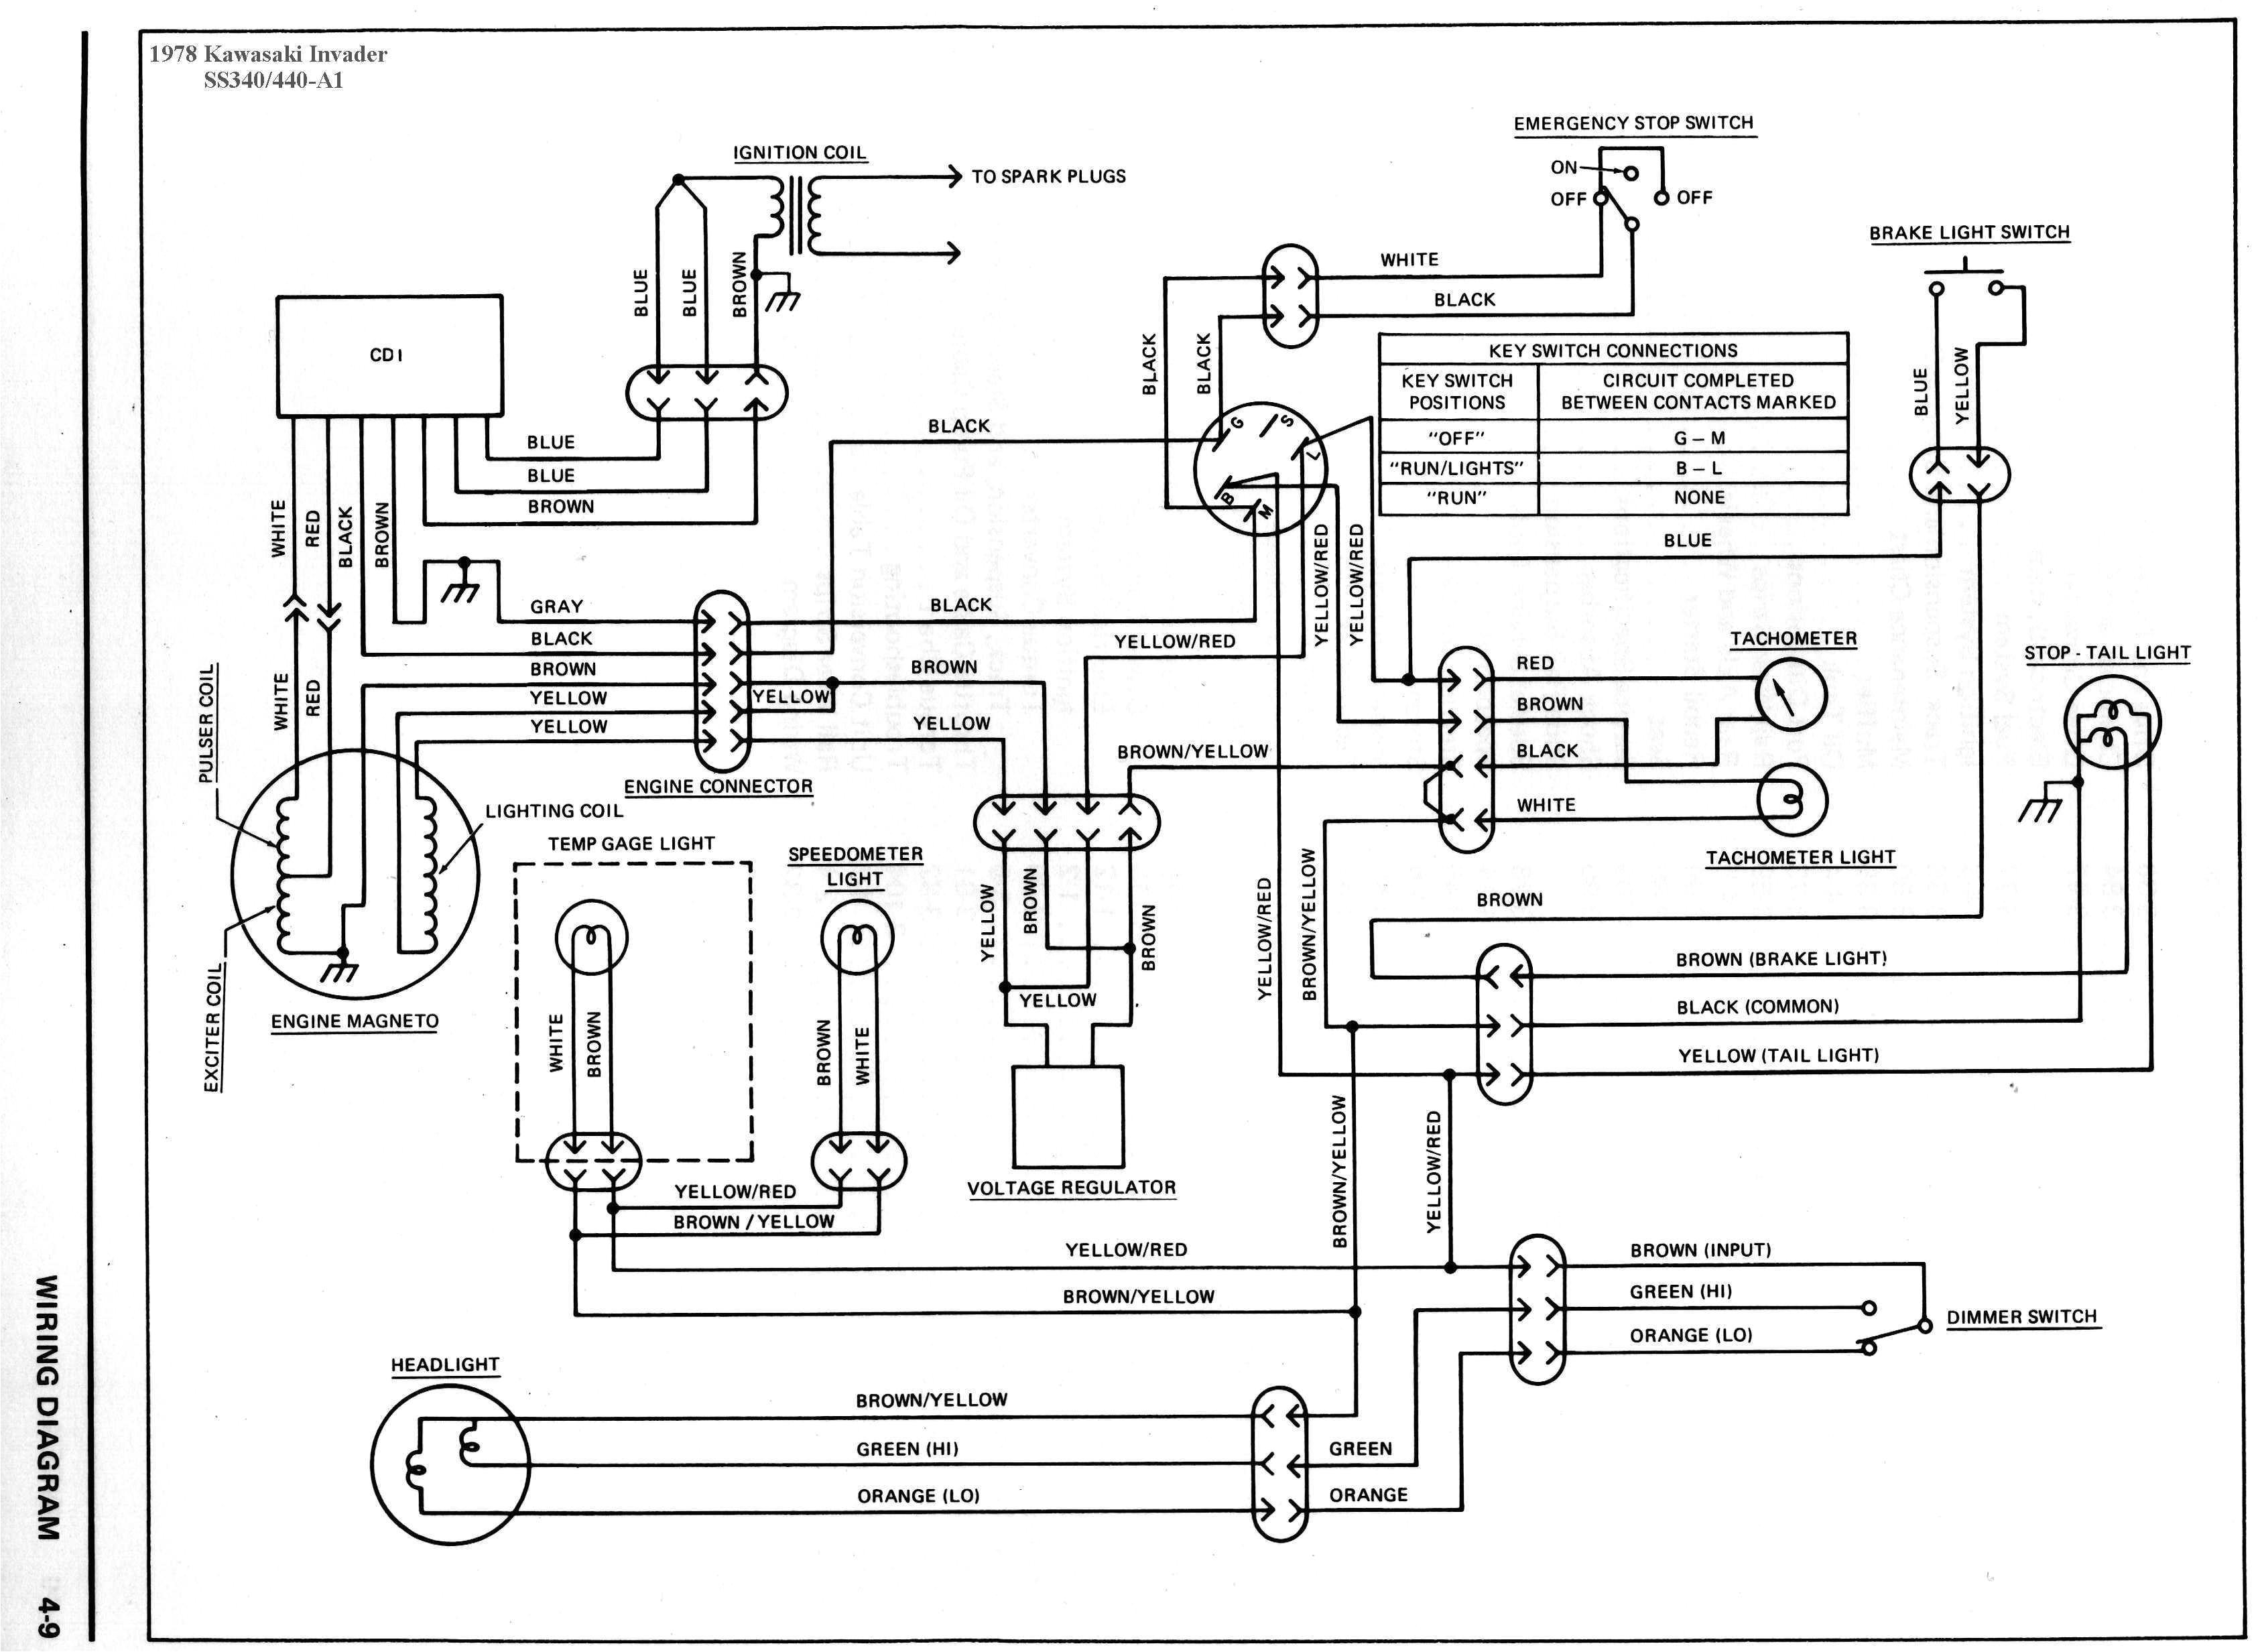 i need a wiring diagram for kawasaki 220 bayou mod